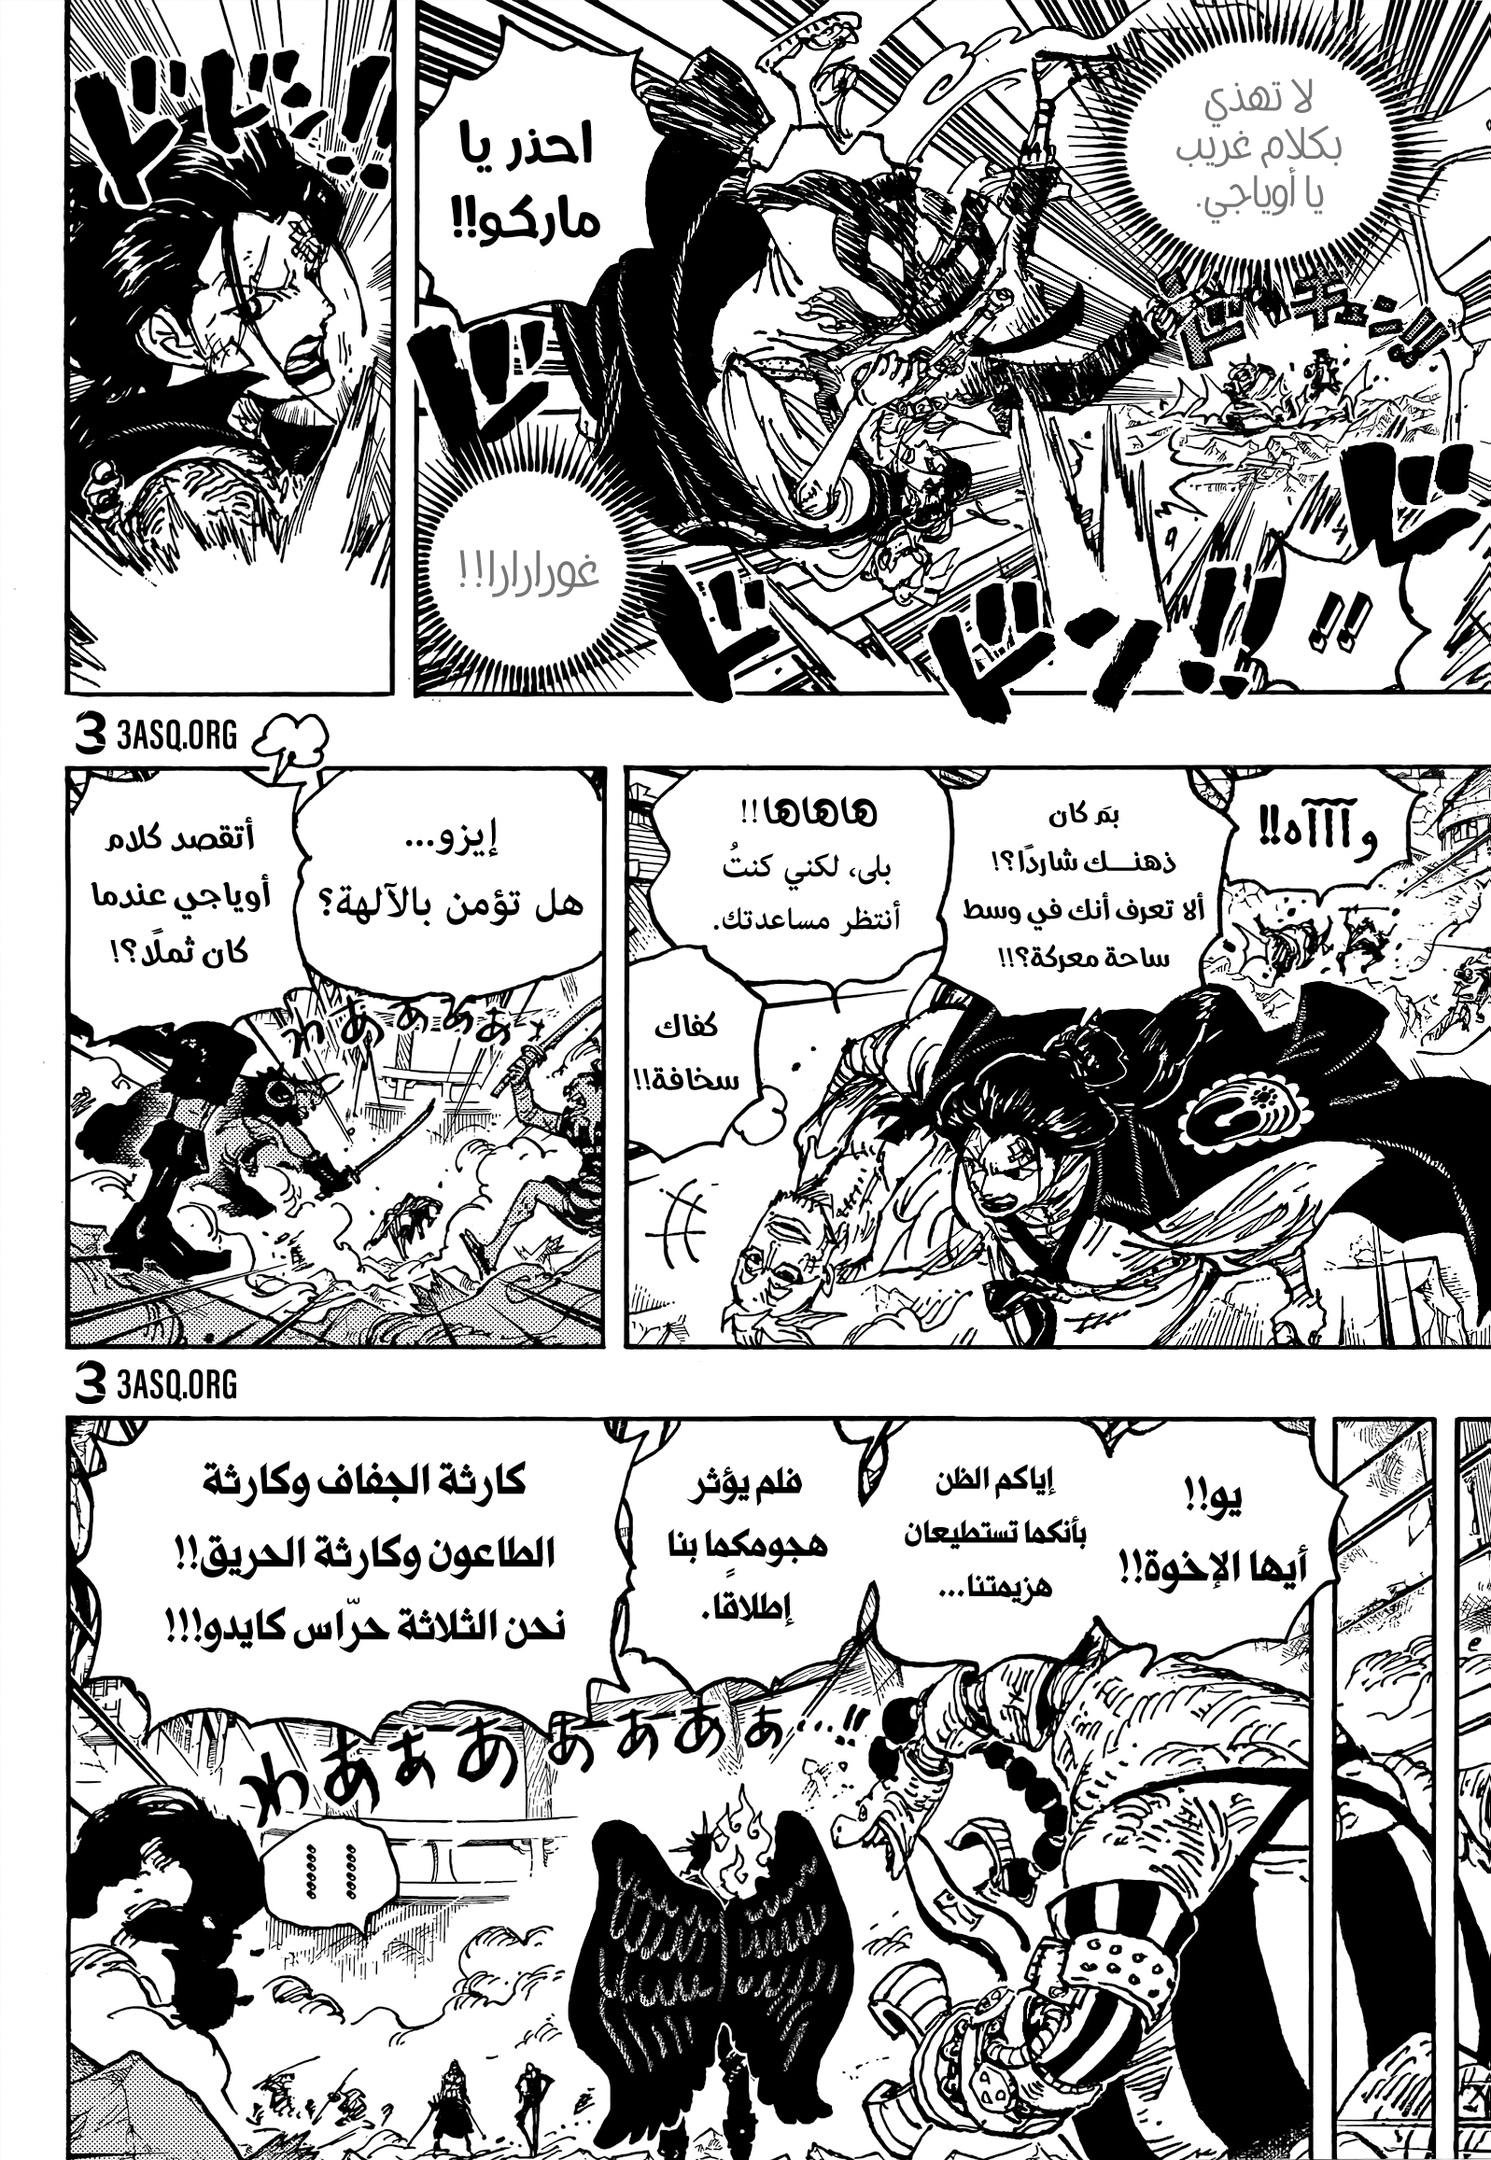 One Piece Arab 1023, image №5